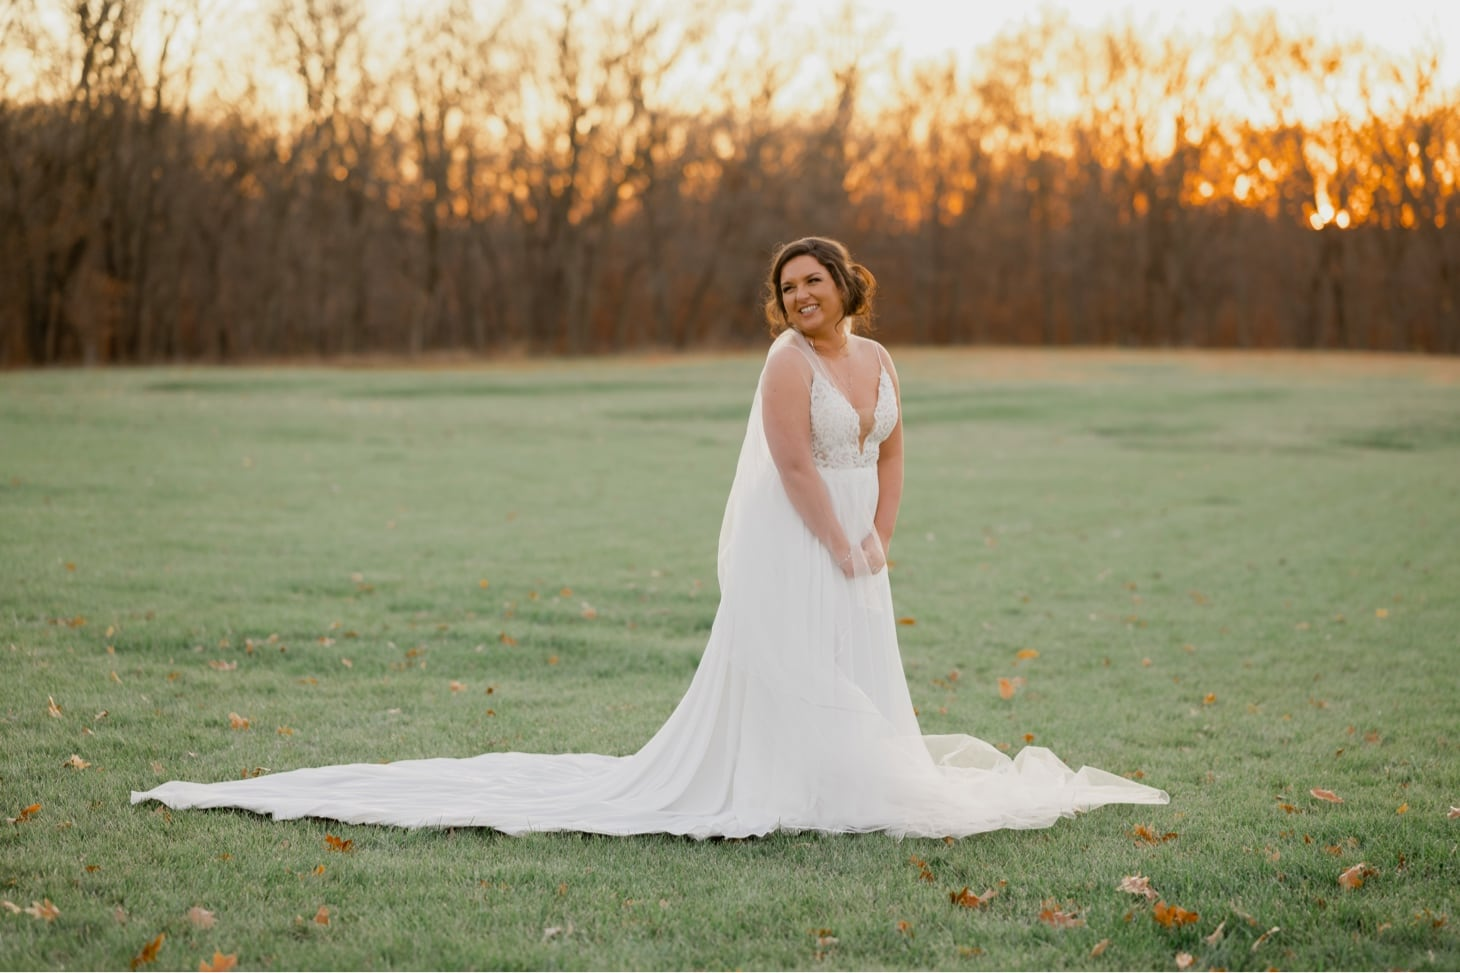 bridal portrait at sunset country lane lodge